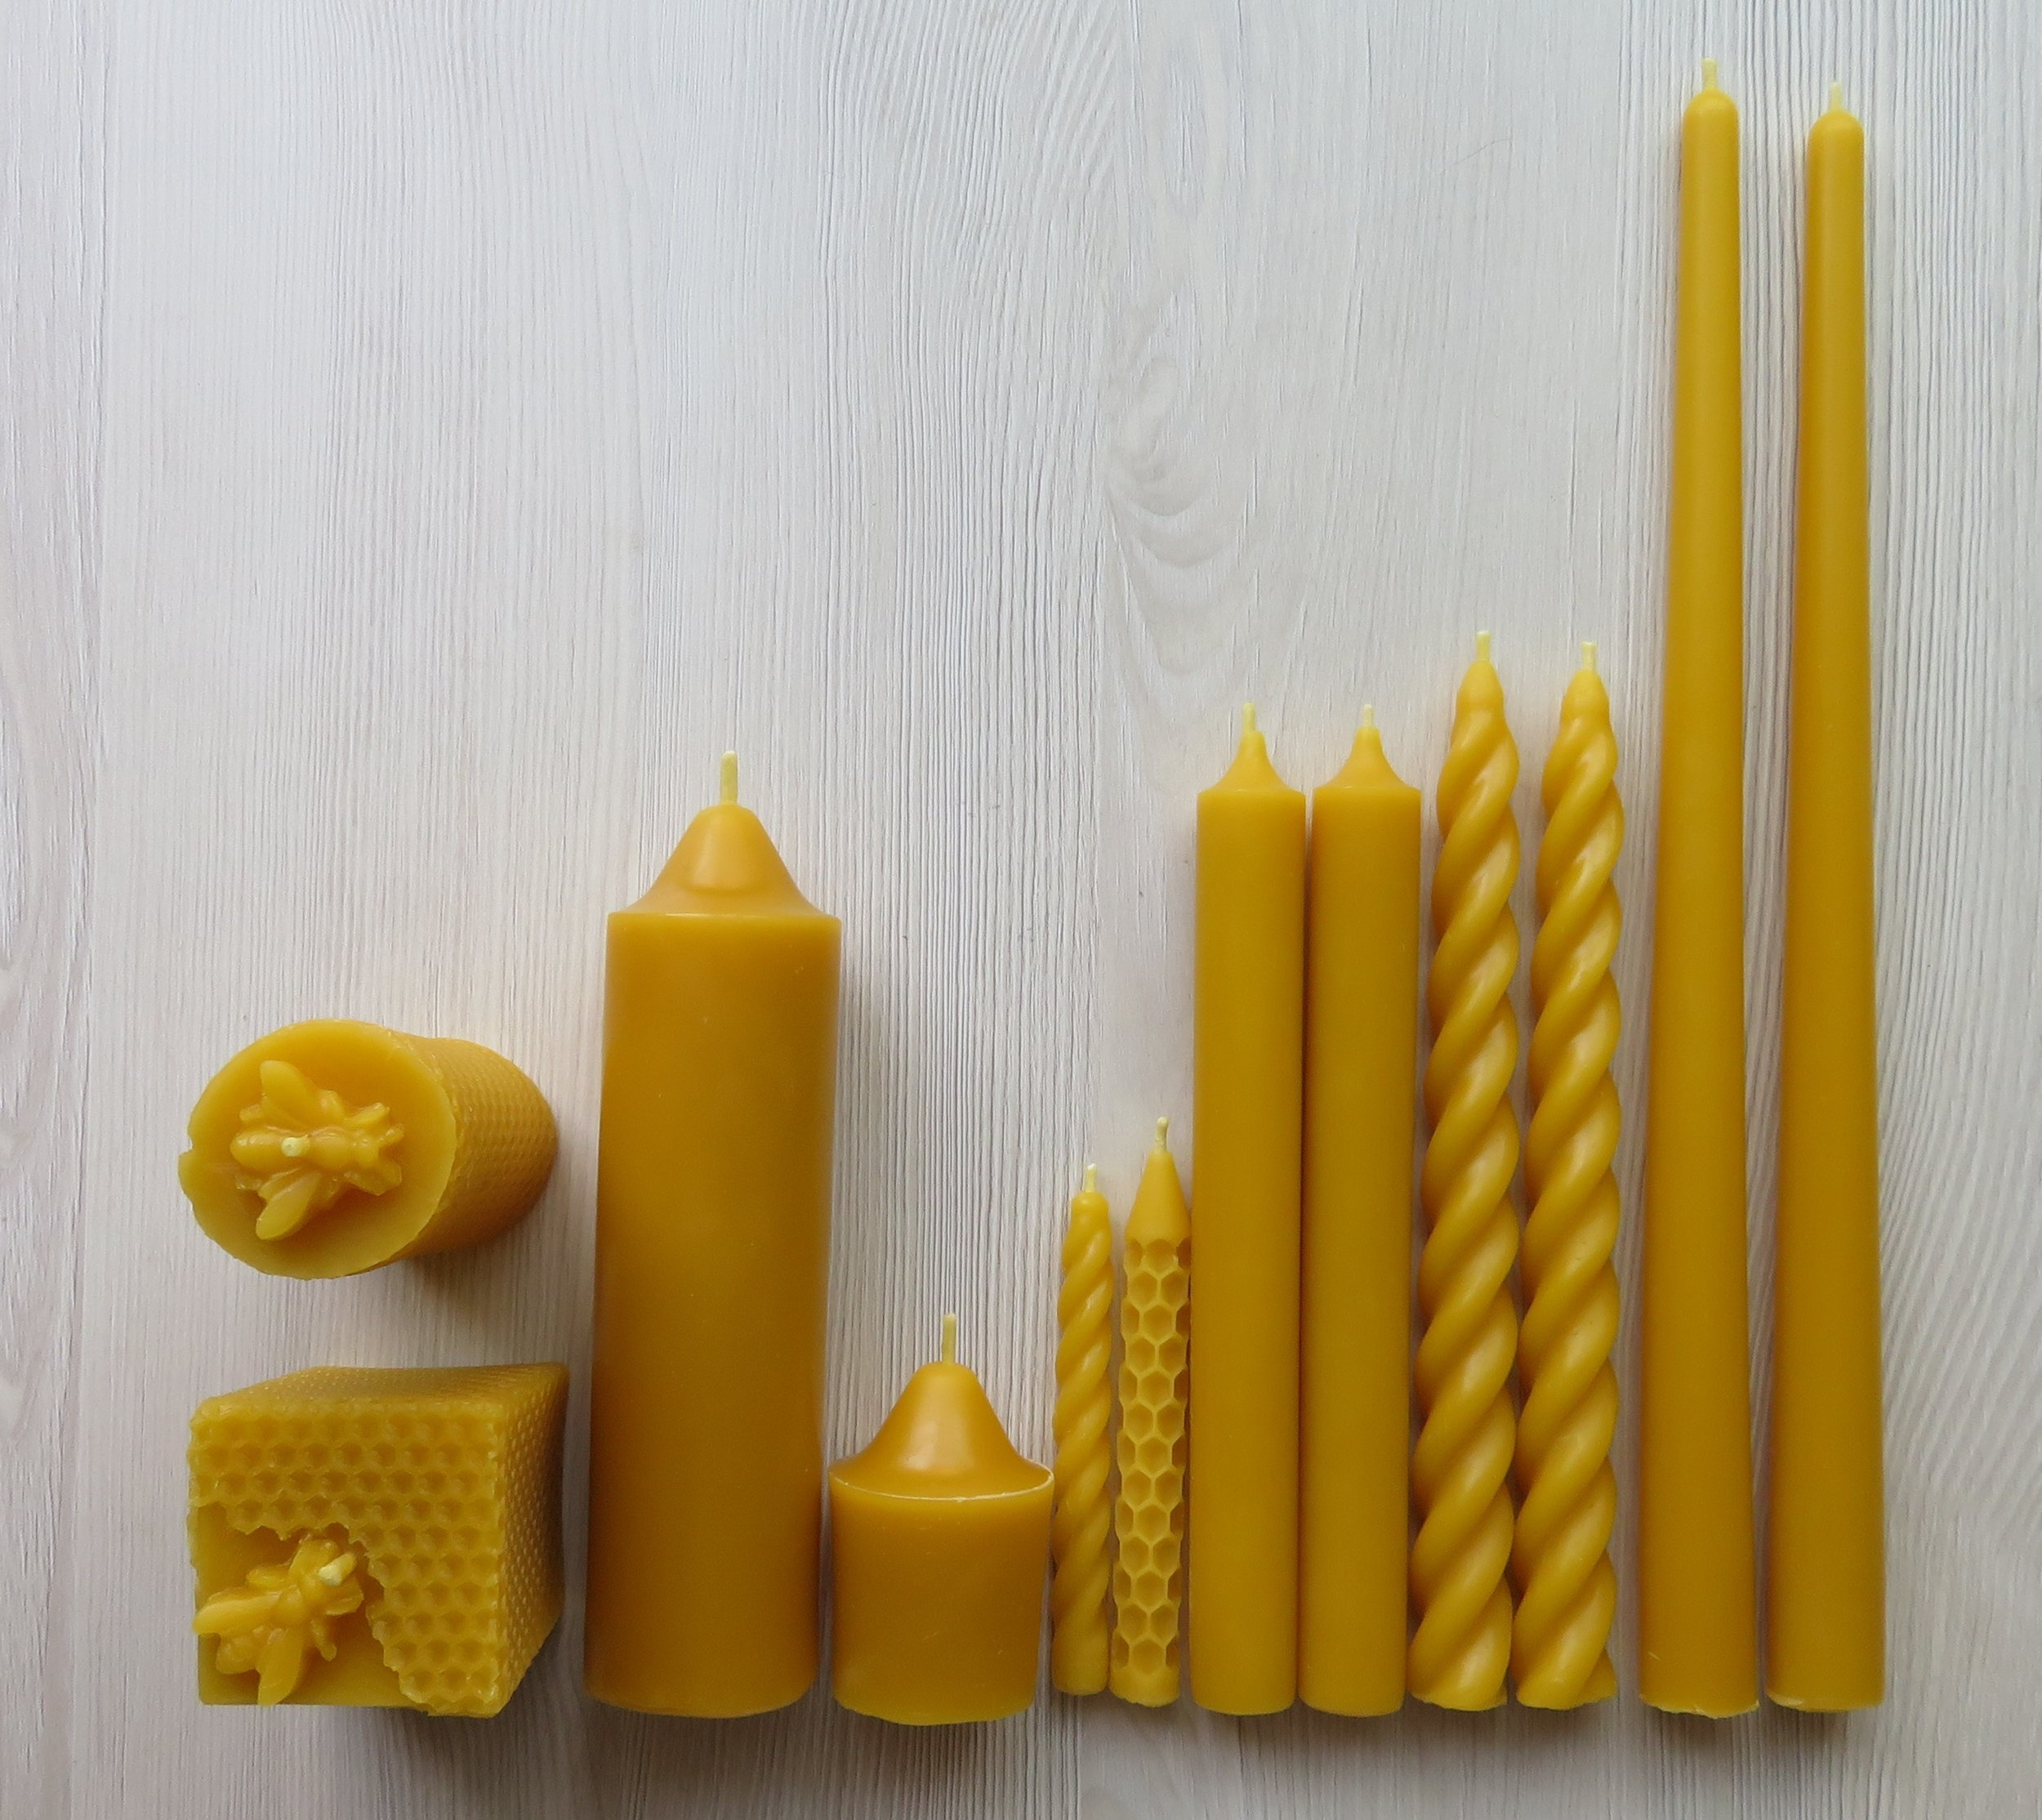 Honey Bee Candles handmade by Priscilla and Pravana